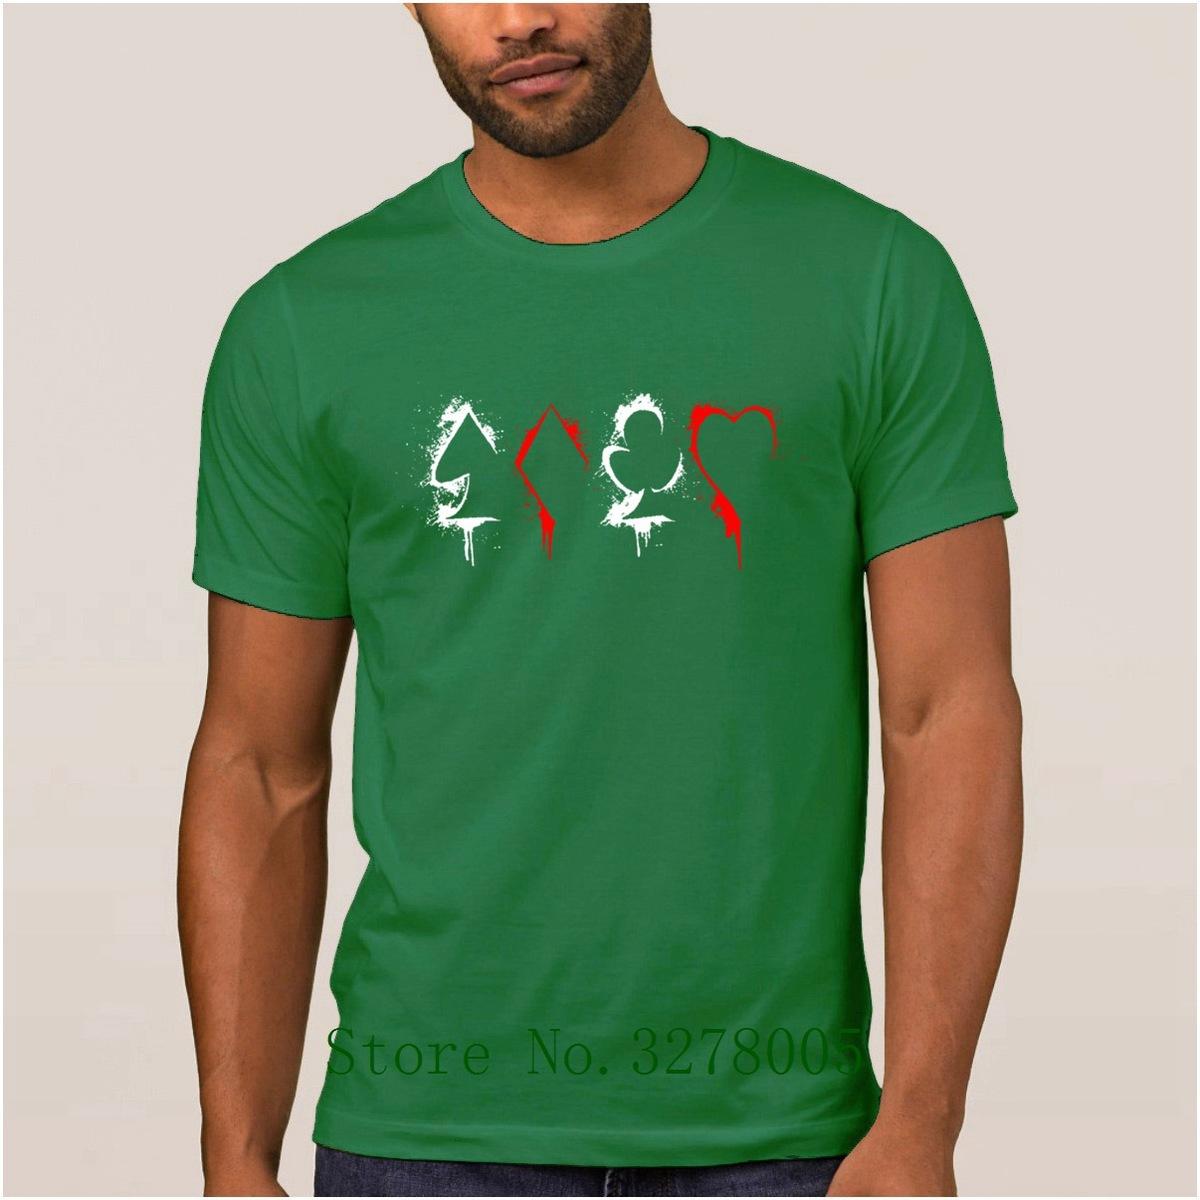 Design and Order Letters Nouveau T Shirt Mens Poker Shirt T-Shirt pour hommes populaires Summer Style Grandes tailles Gents Tee Shirts Vente chaude